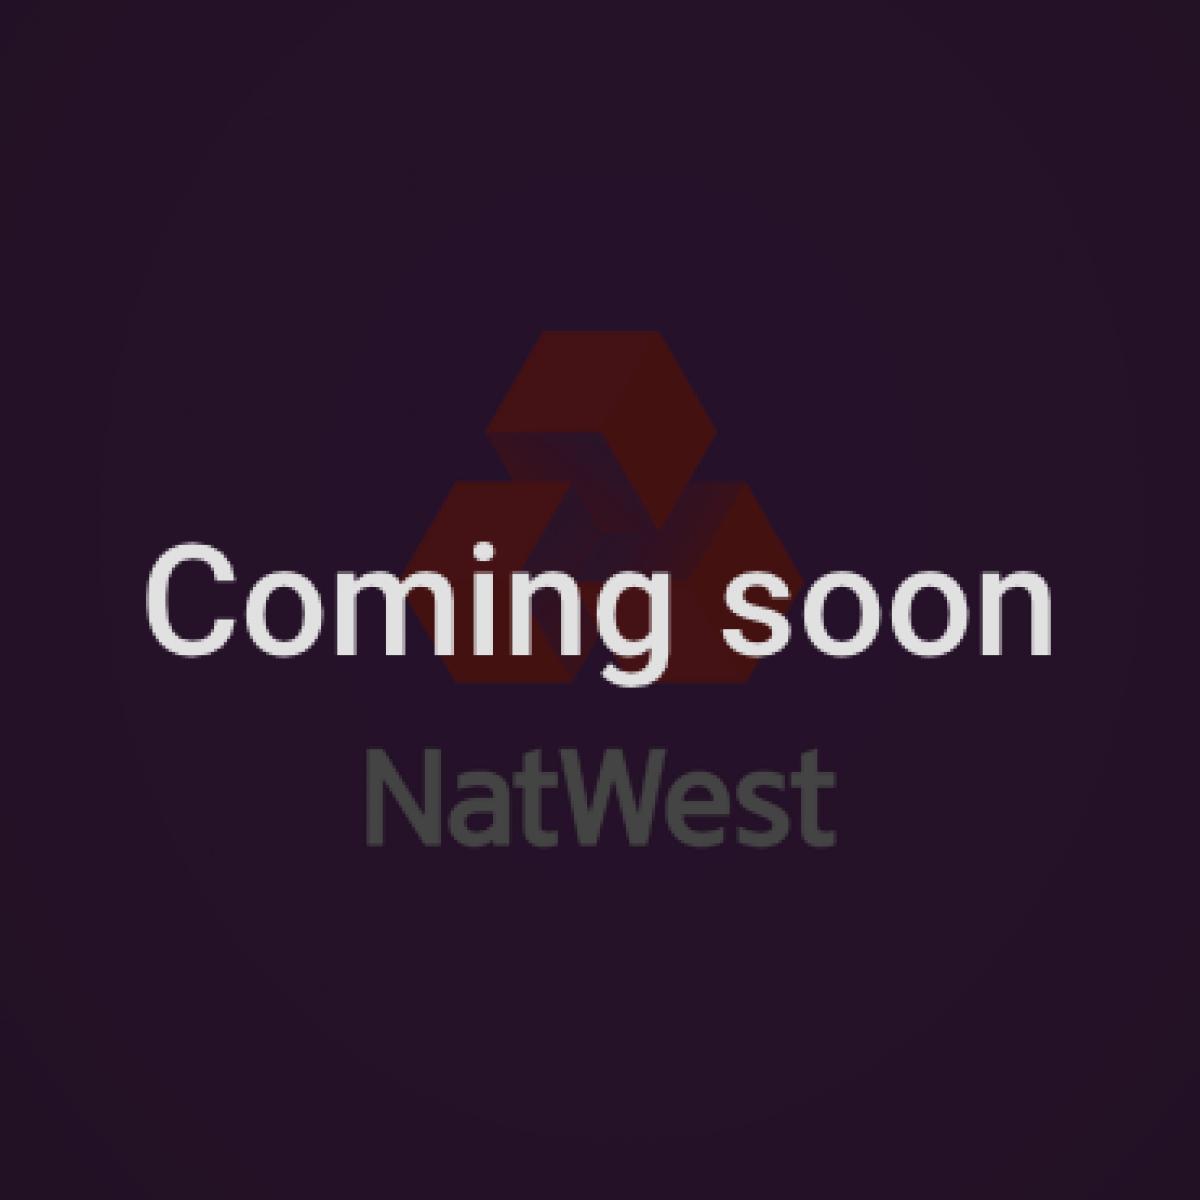 Natwest-soon